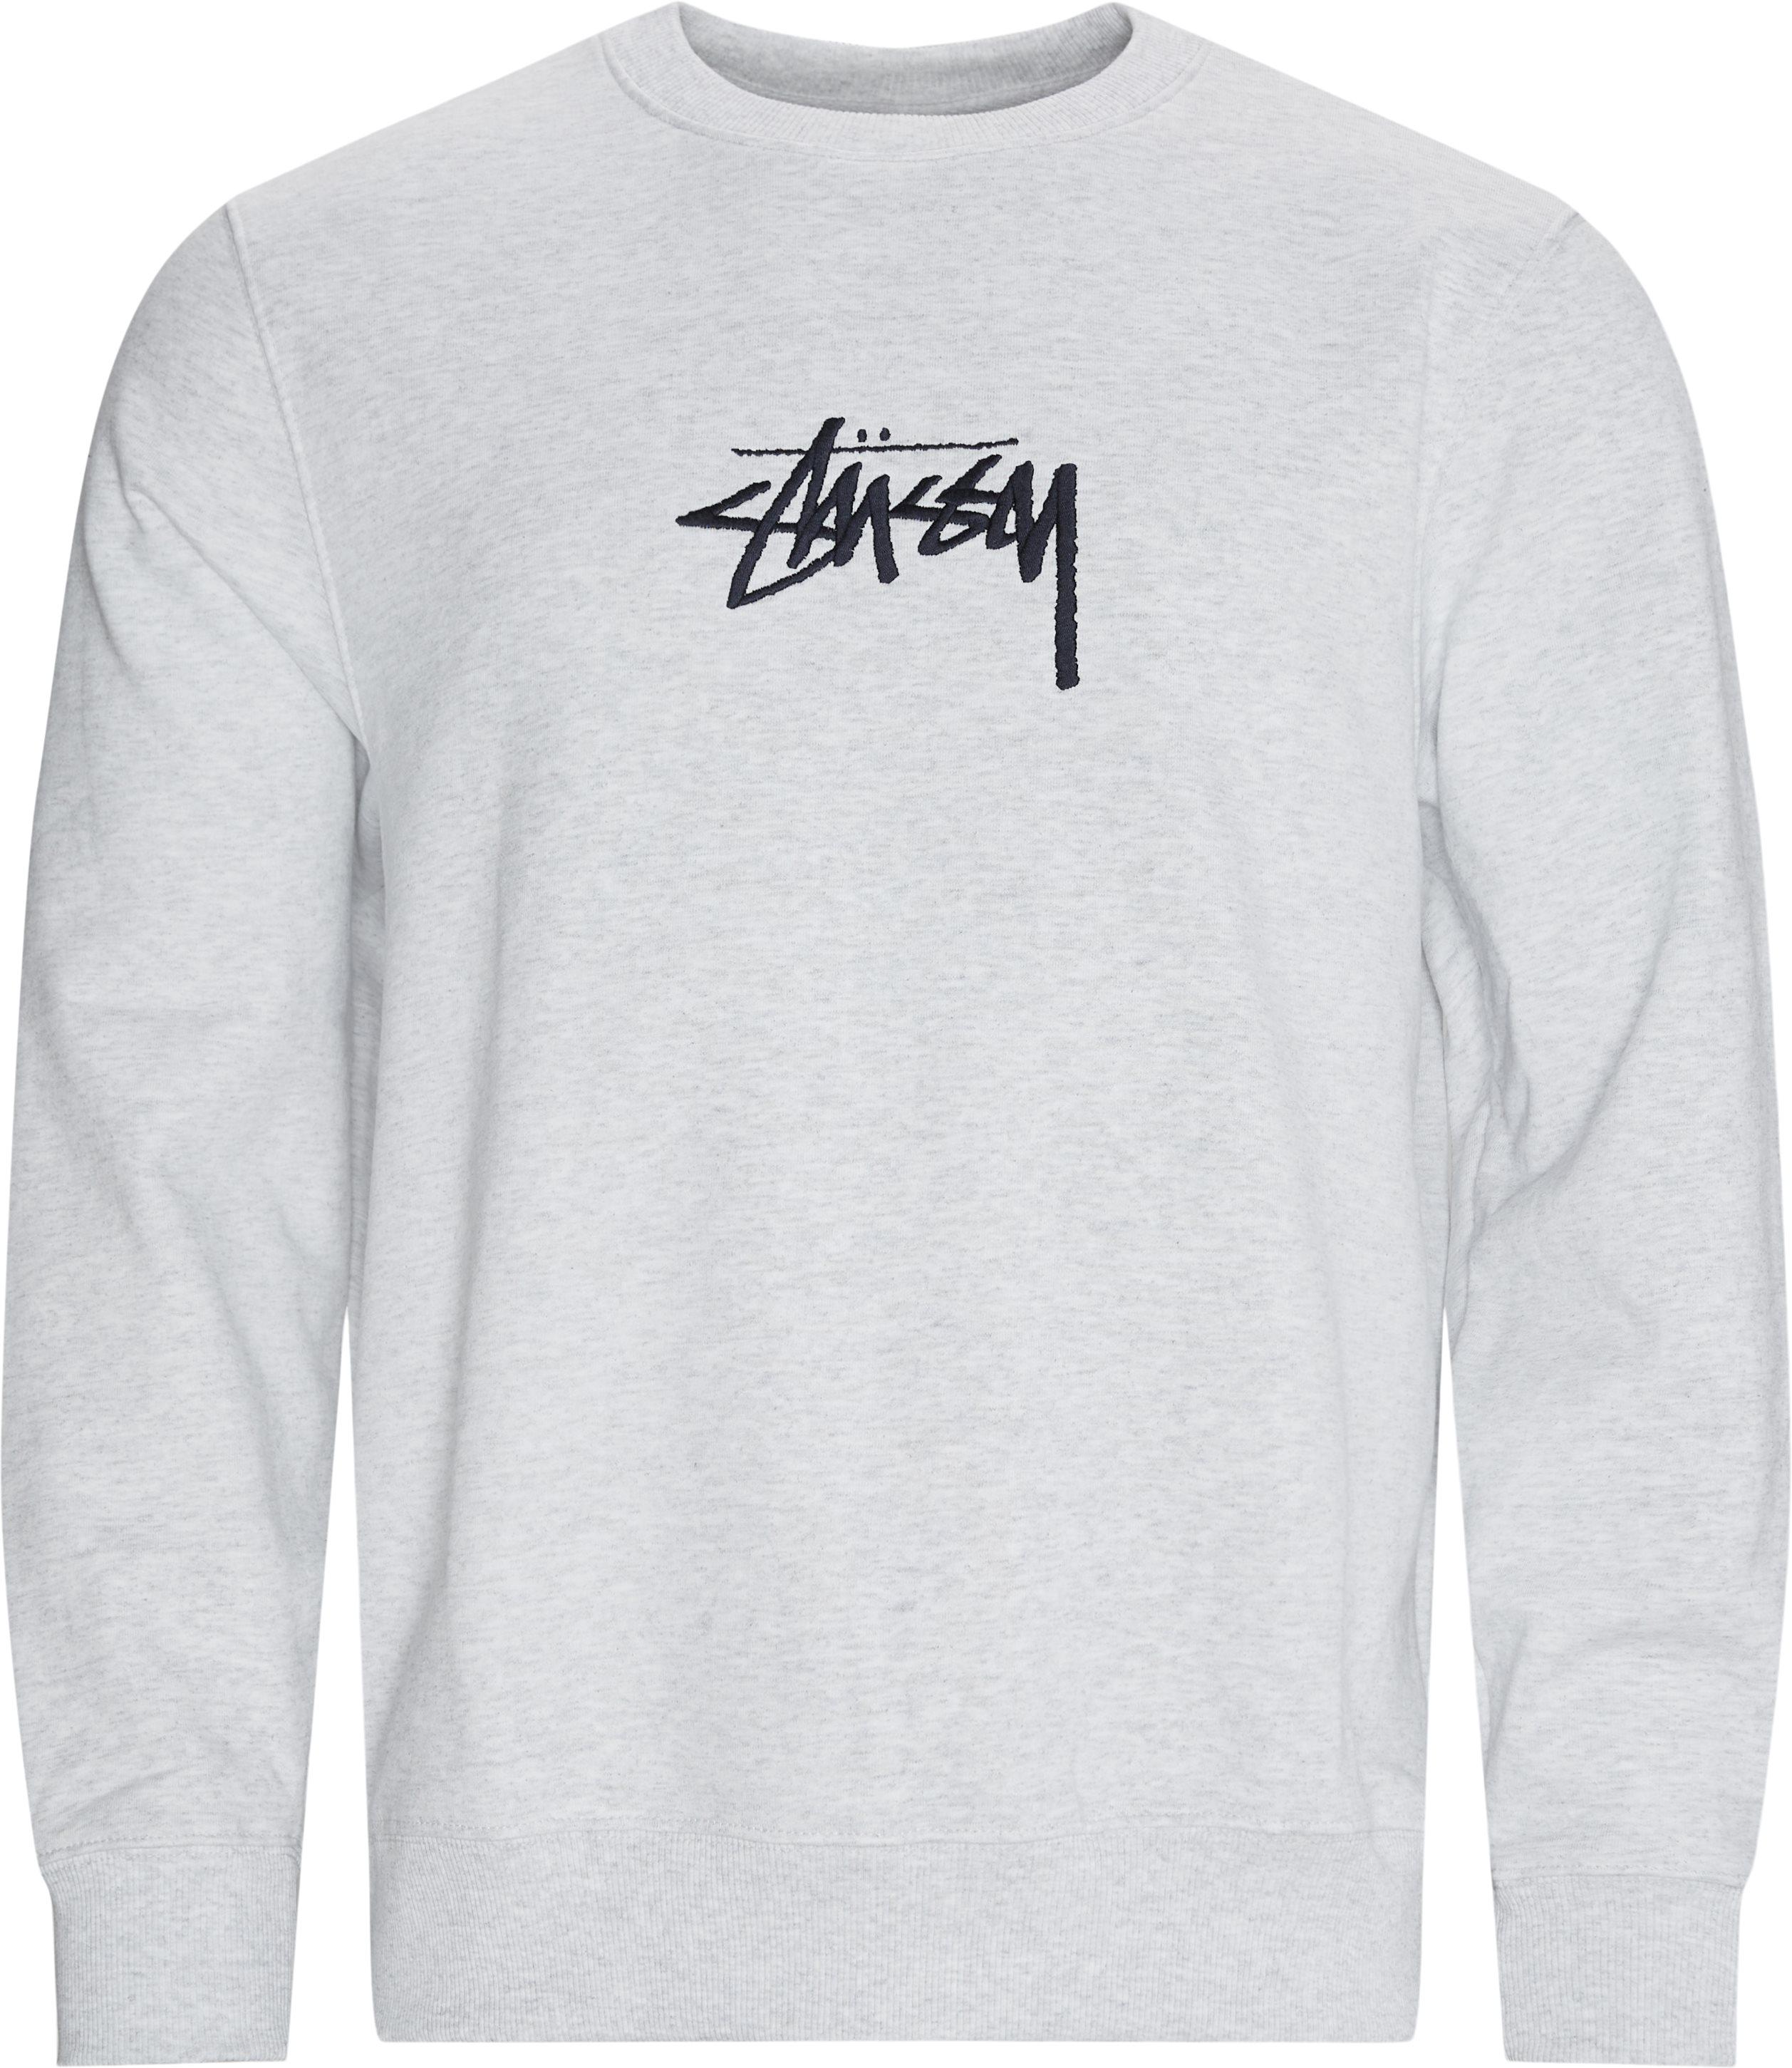 Stock Applique Crewneck Sweatshirt - Sweatshirts - Regular - Grey